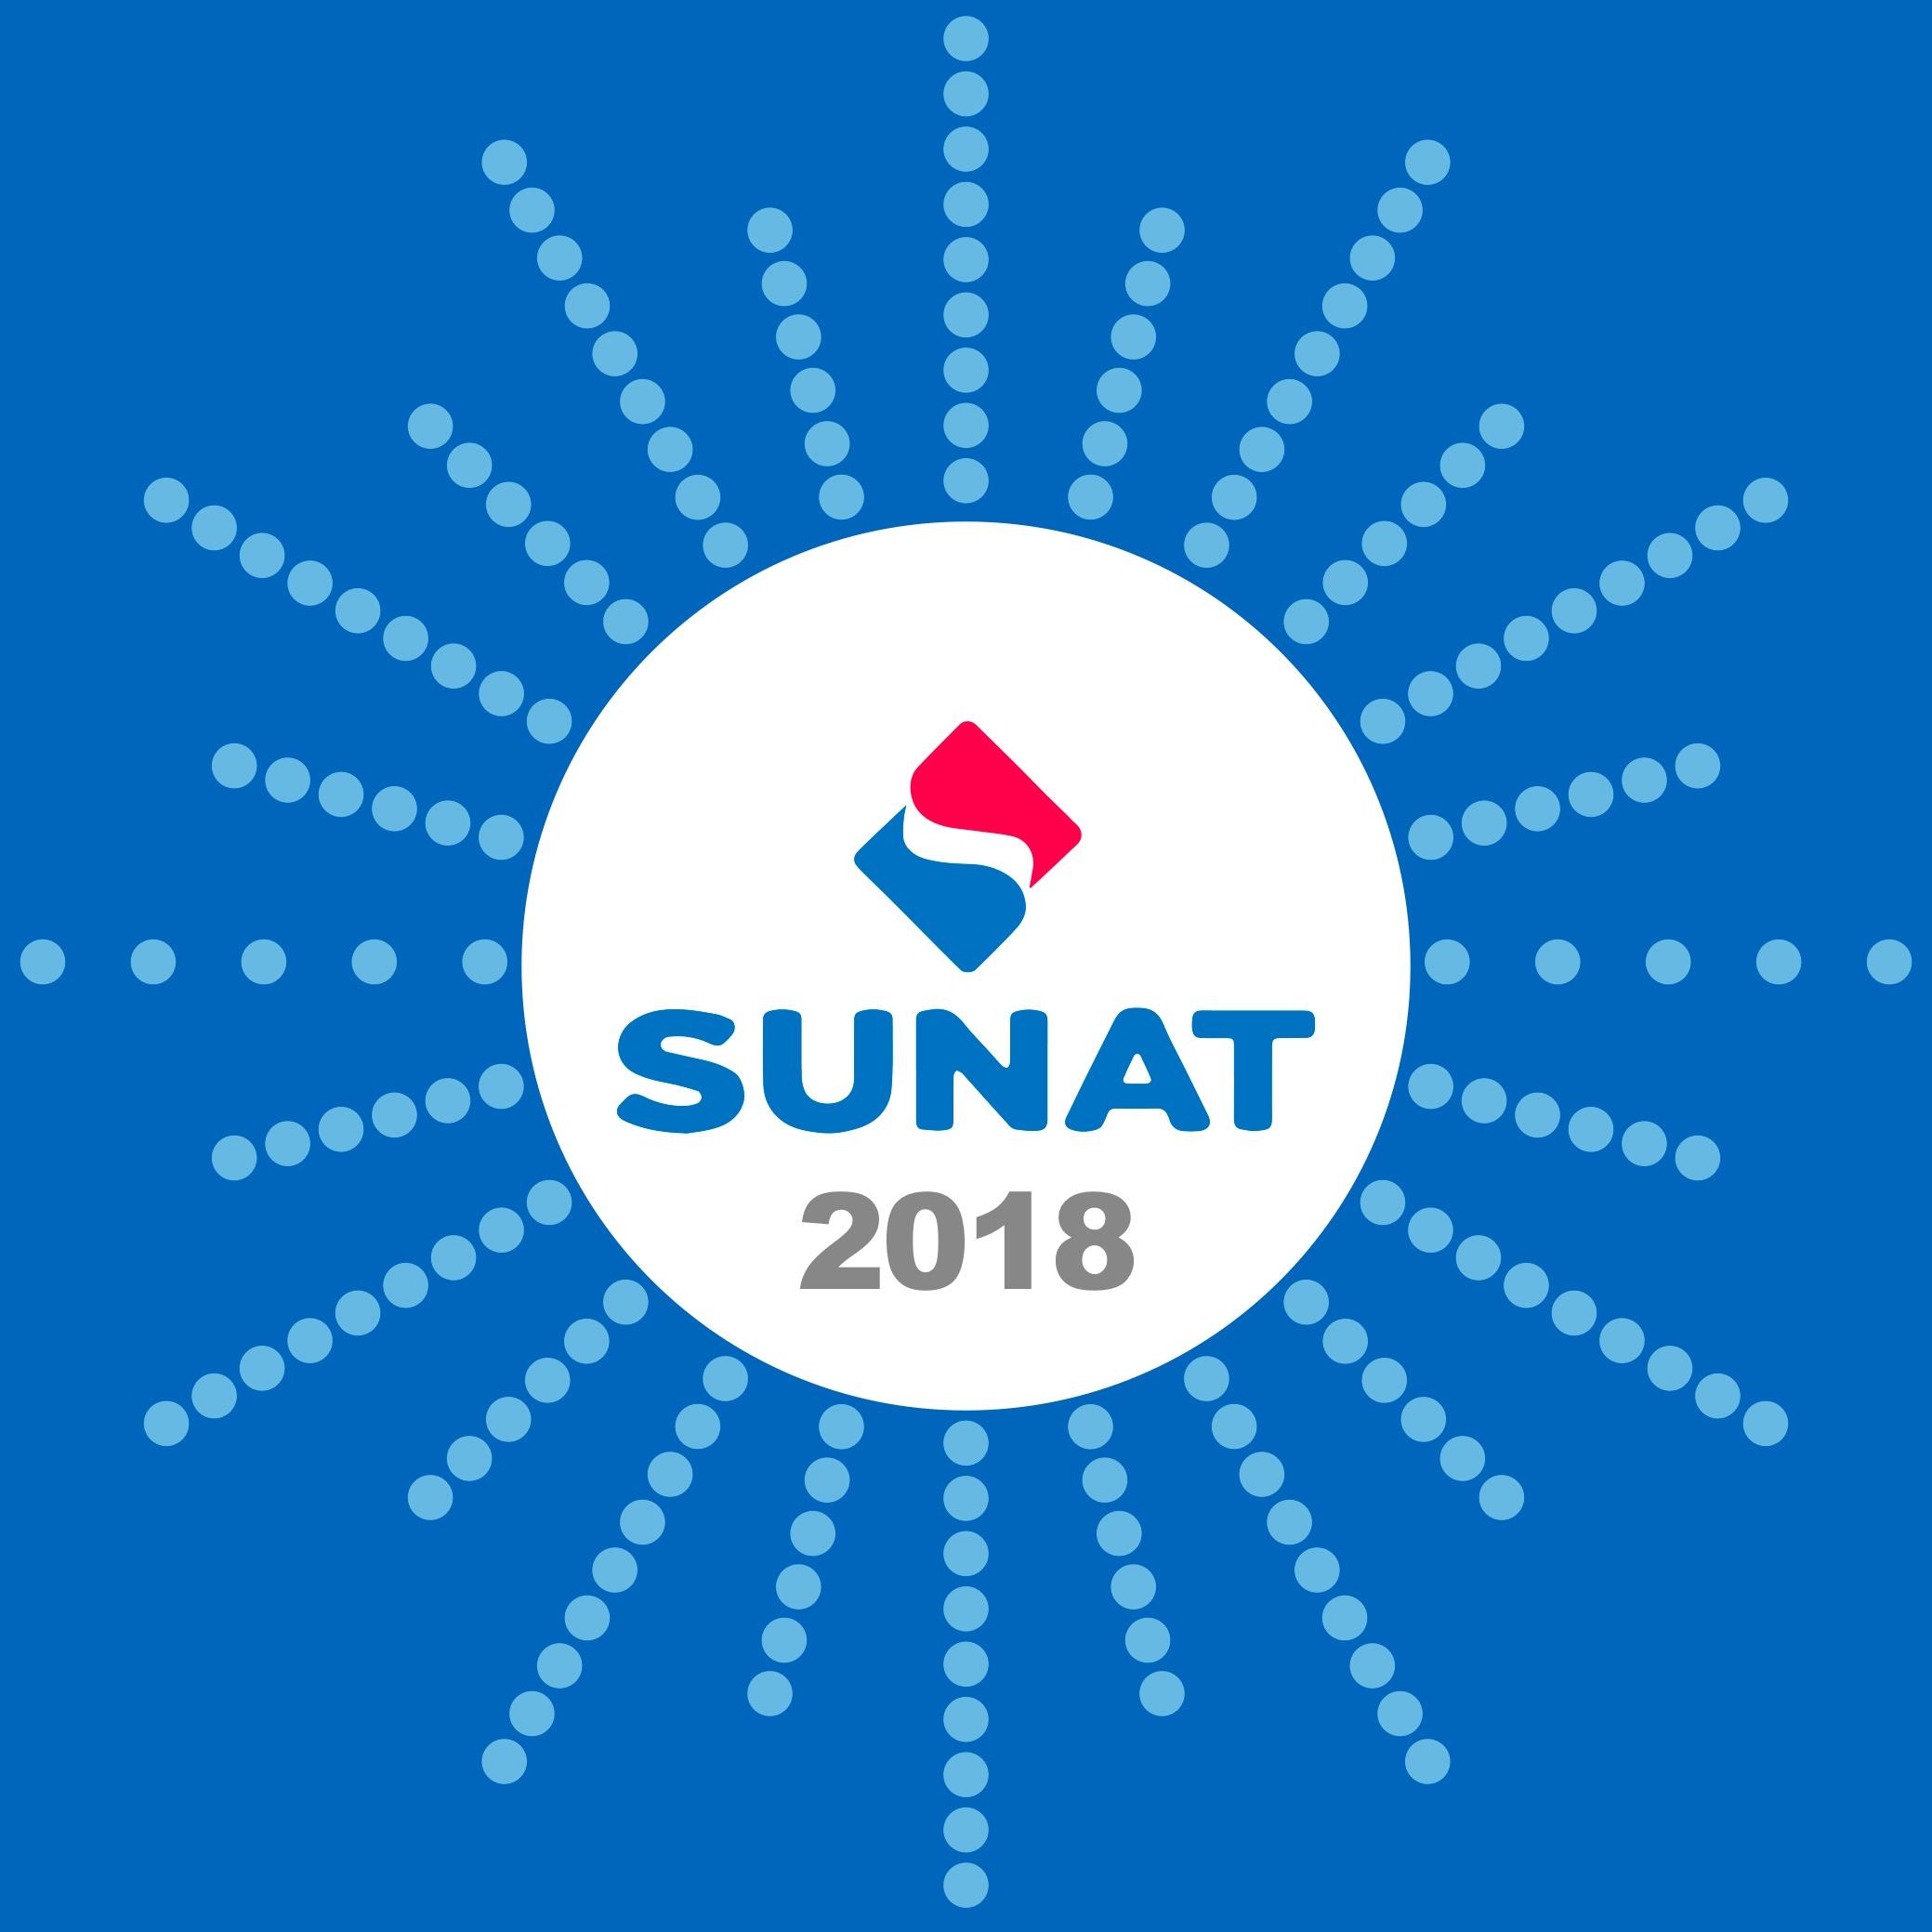 Aplazamiento prorroga para emitir comprobantes de pago electronicos resolucion de superintendencia no 155 2017 sunat